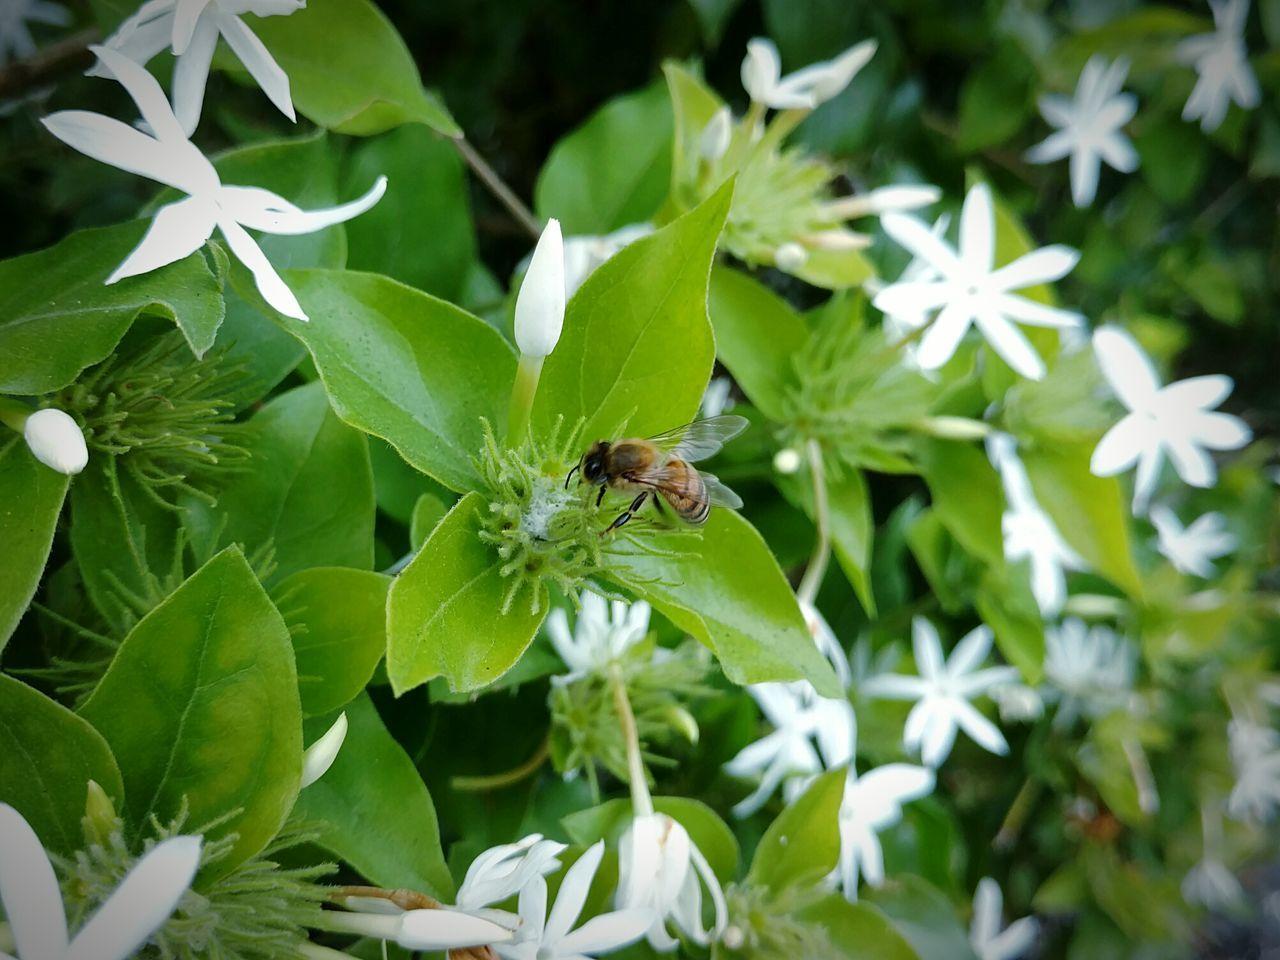 Nature Plant Animal Themes One Animal Outdoors Close-up Insect Freshness Honey Bee Bee White Flowers White Jasmine Jasmine Flower